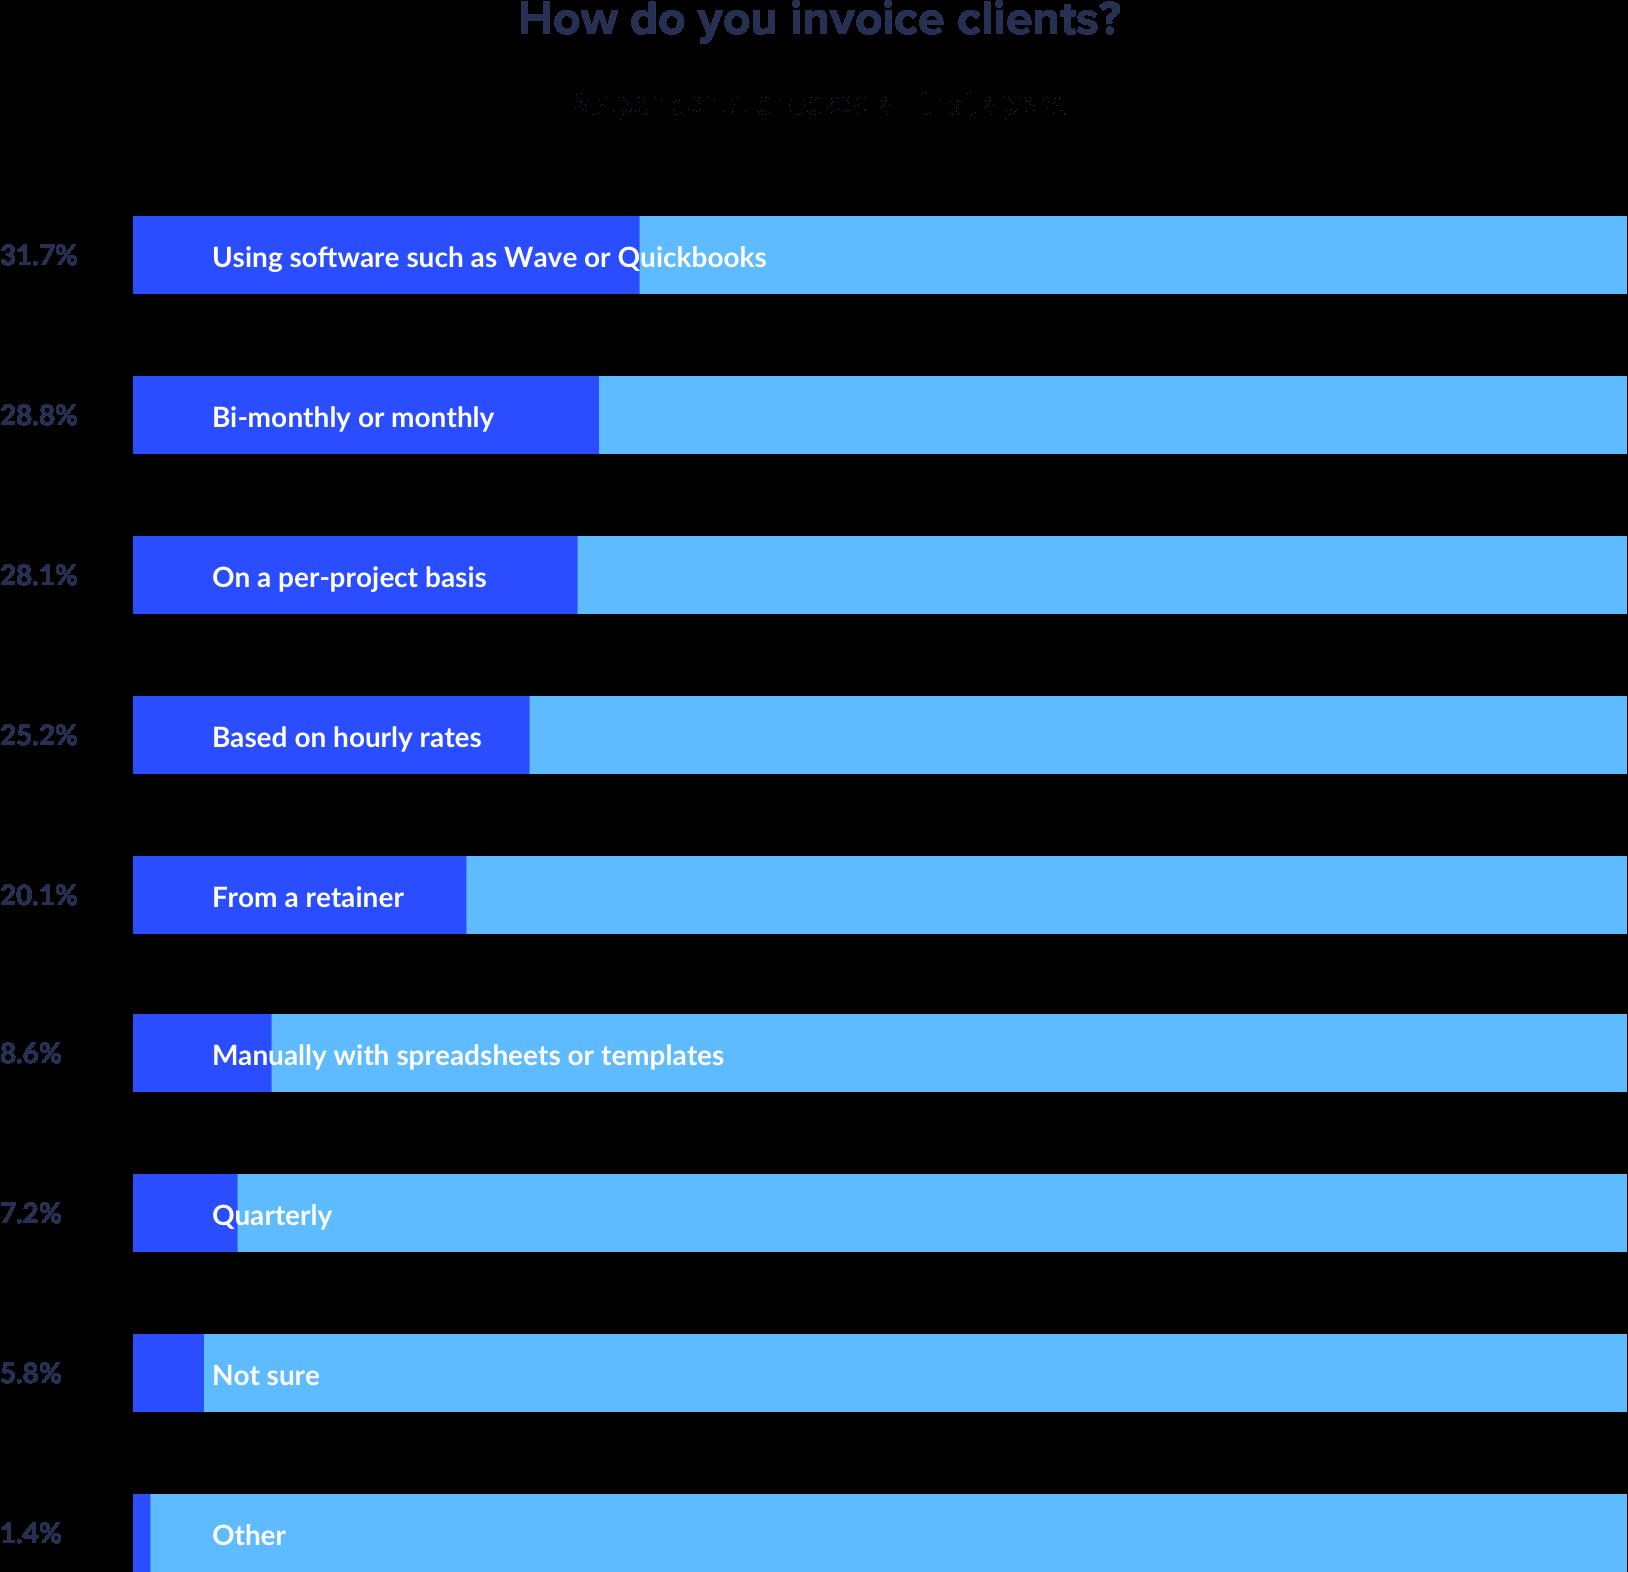 how do agencies invoice clients percentages